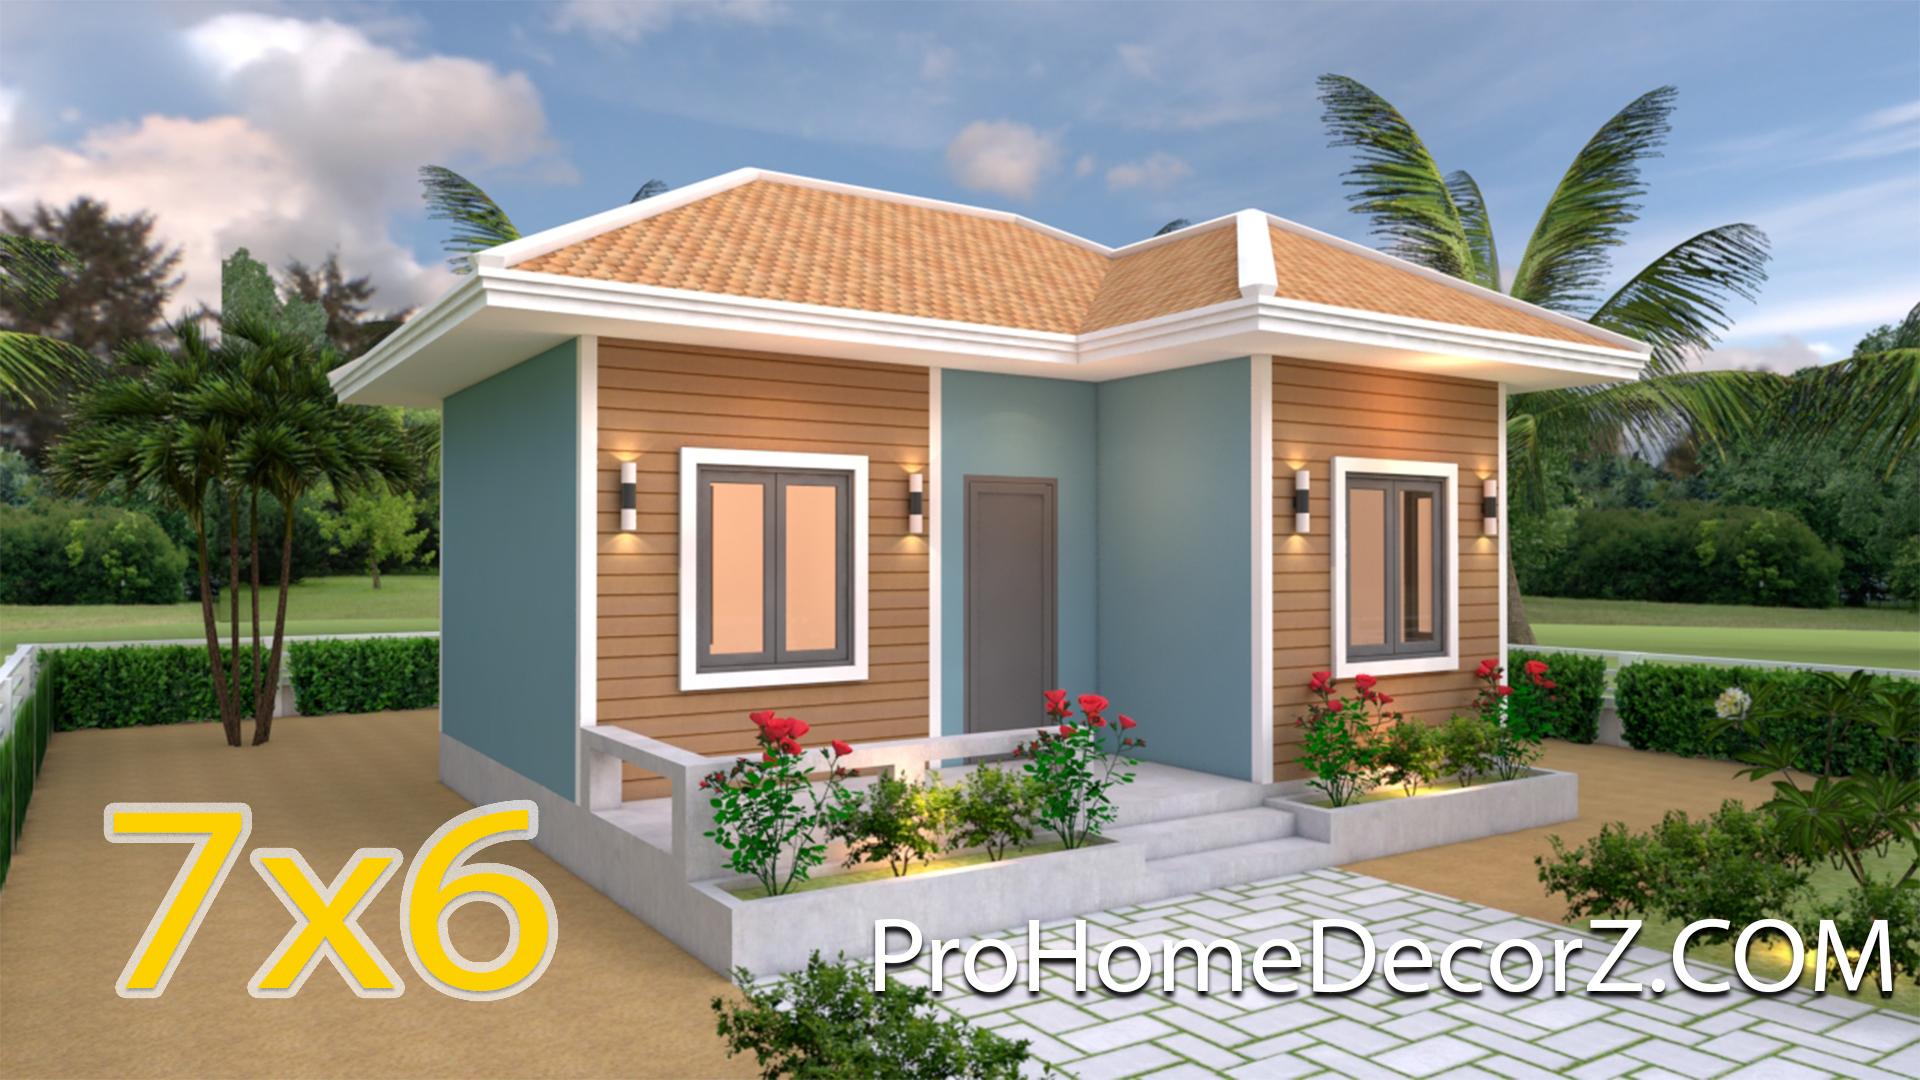 Simple House Designs 7x6 Hip Roof - Pro Home DecorZ